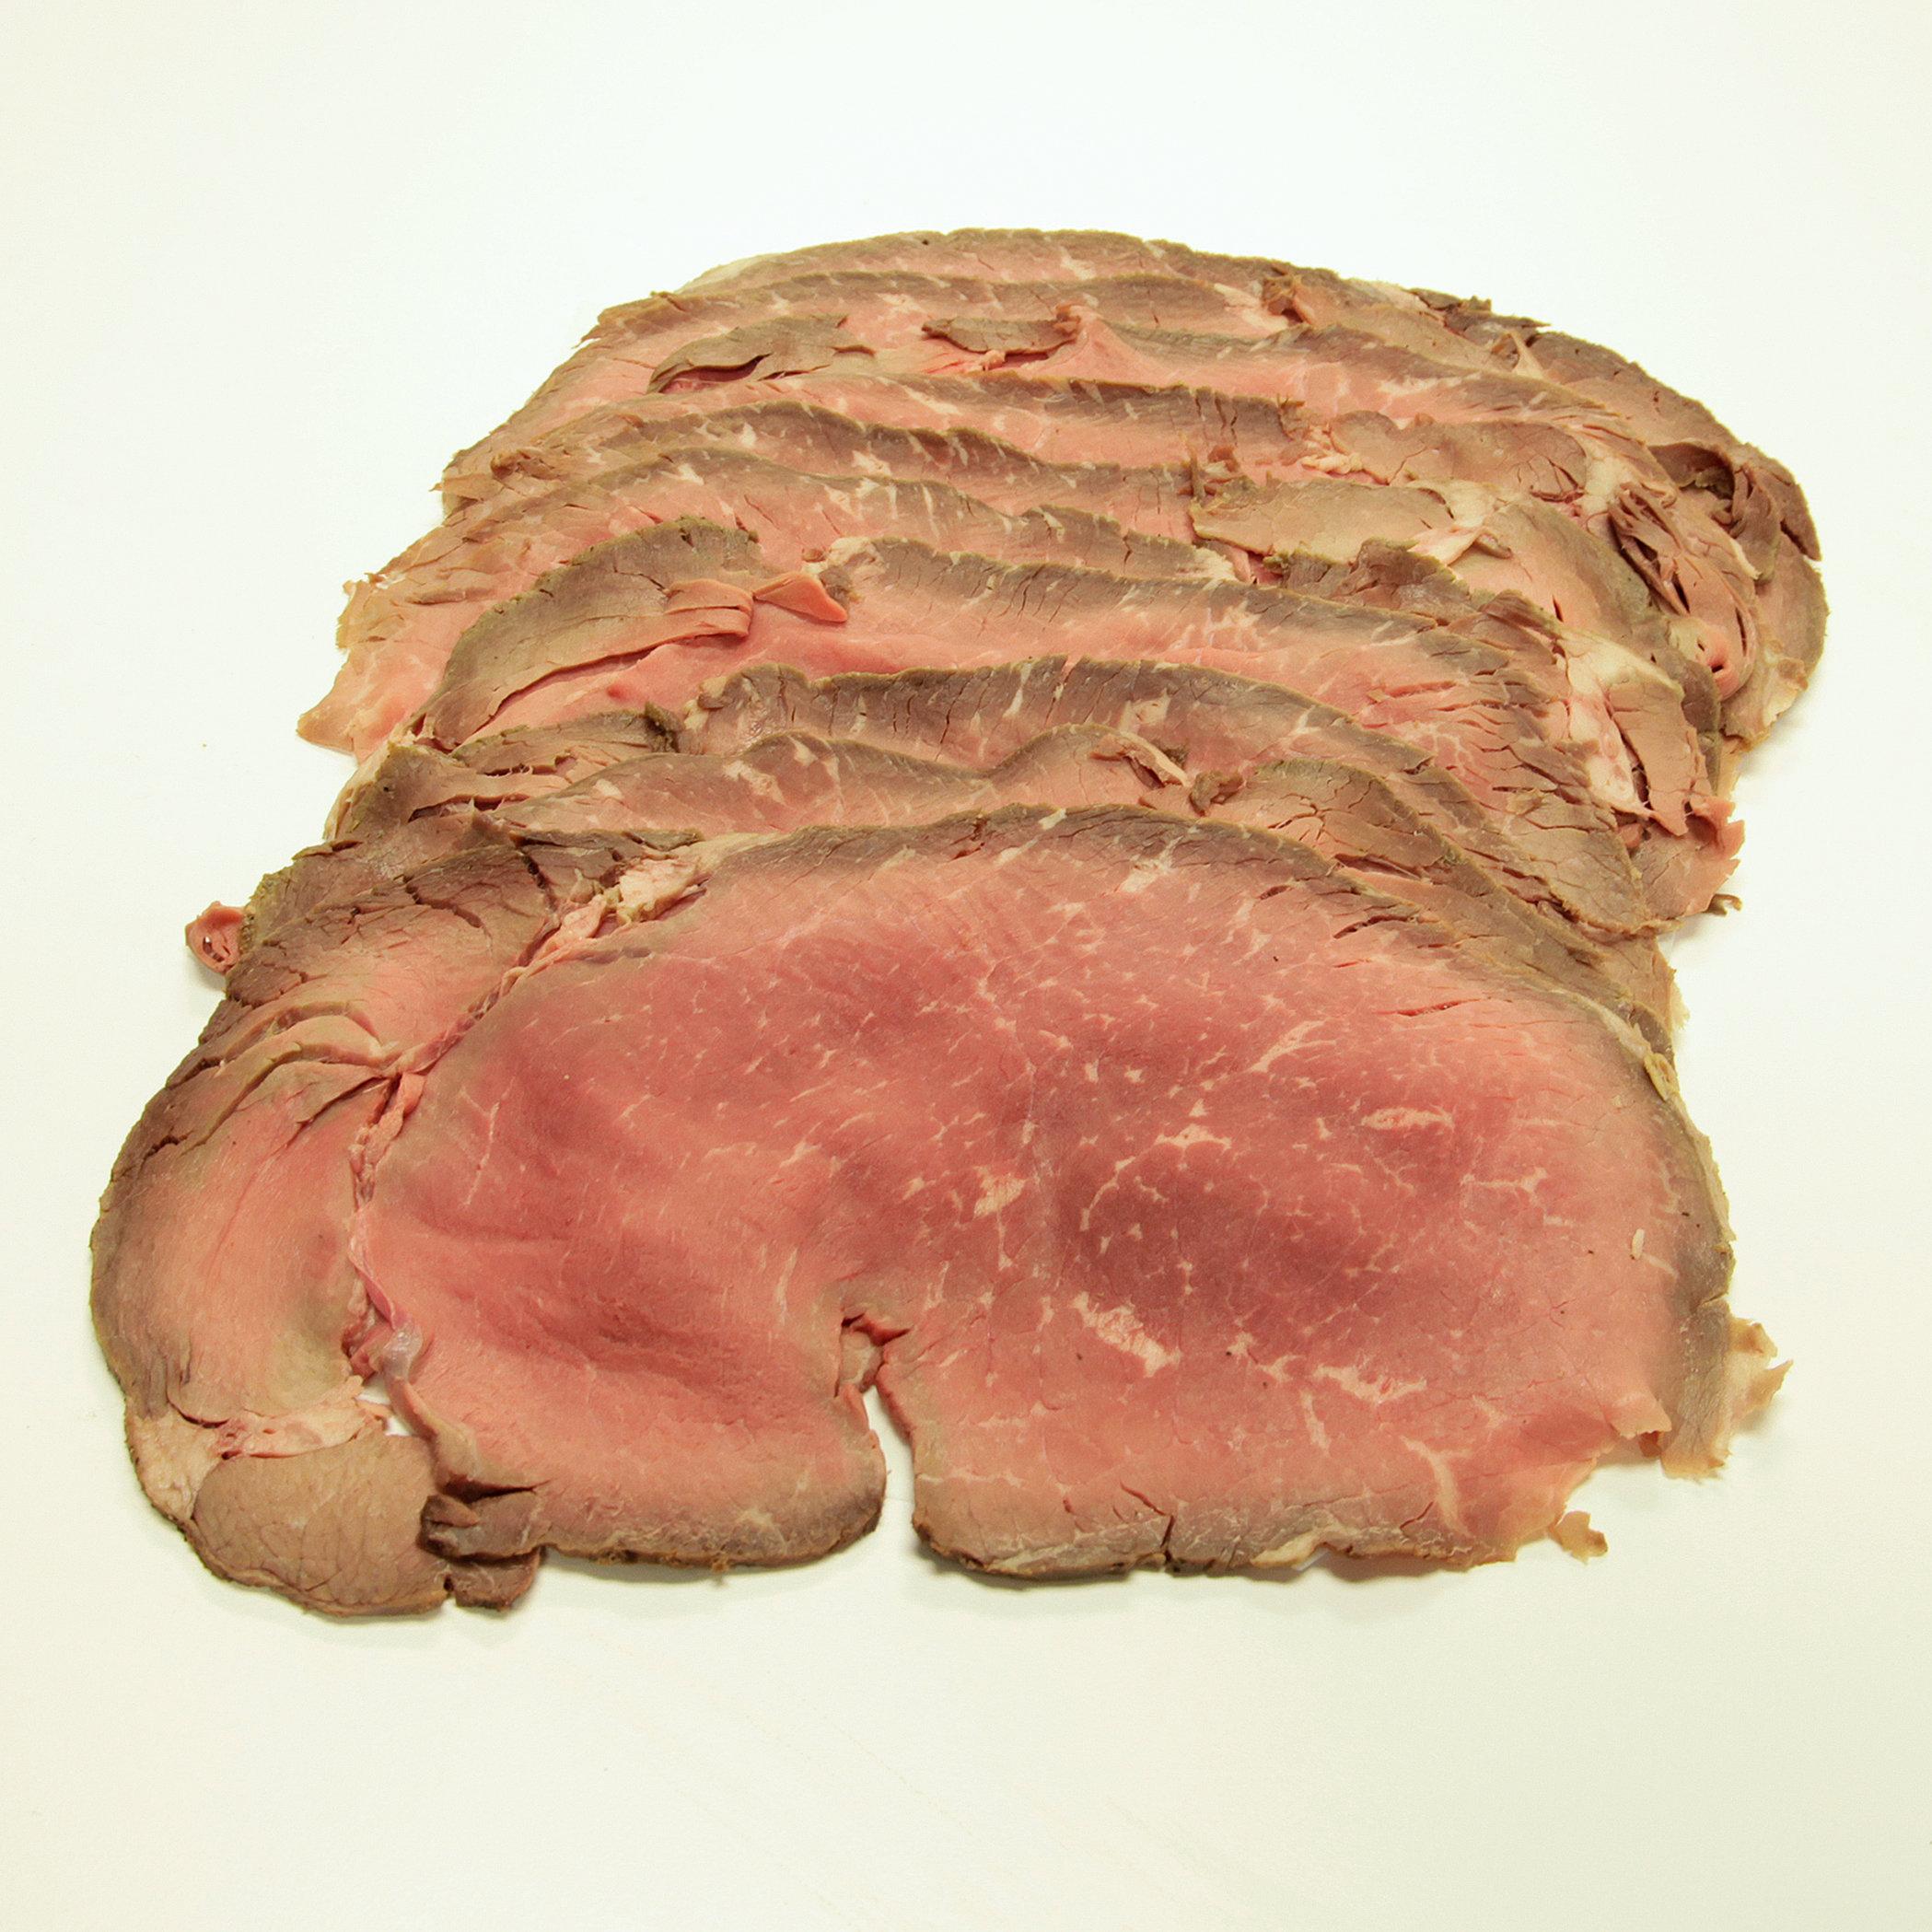 Roast Beef (Deli) 1 lb. 00148